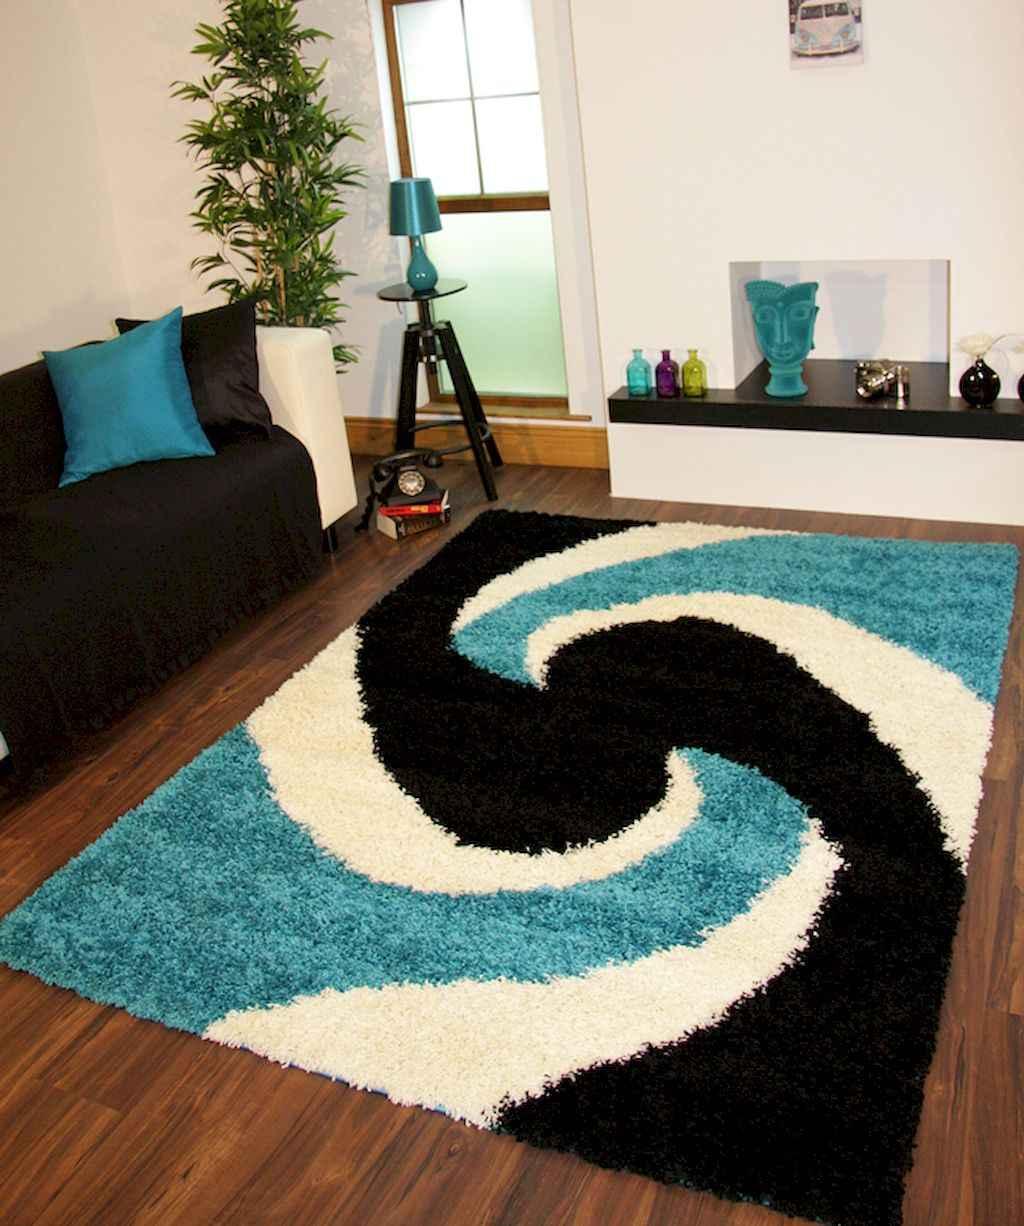 Simple clean vintage living room decorating ideas (28)